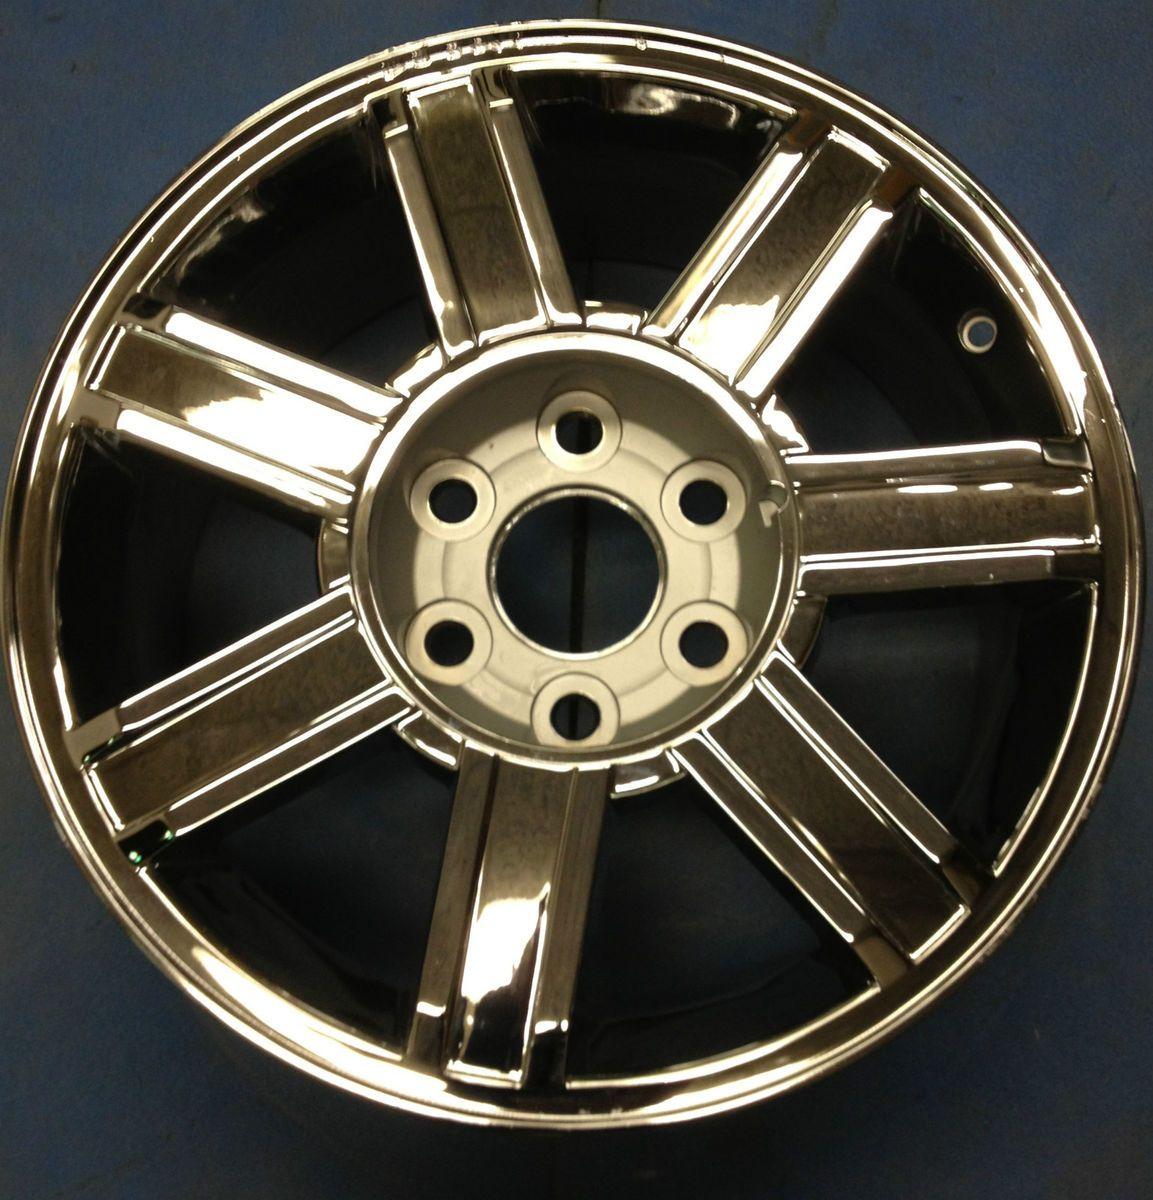 One 2007 2008 2009 Cadillac Escalade Ext ESV 18 Factory Wheel Rim